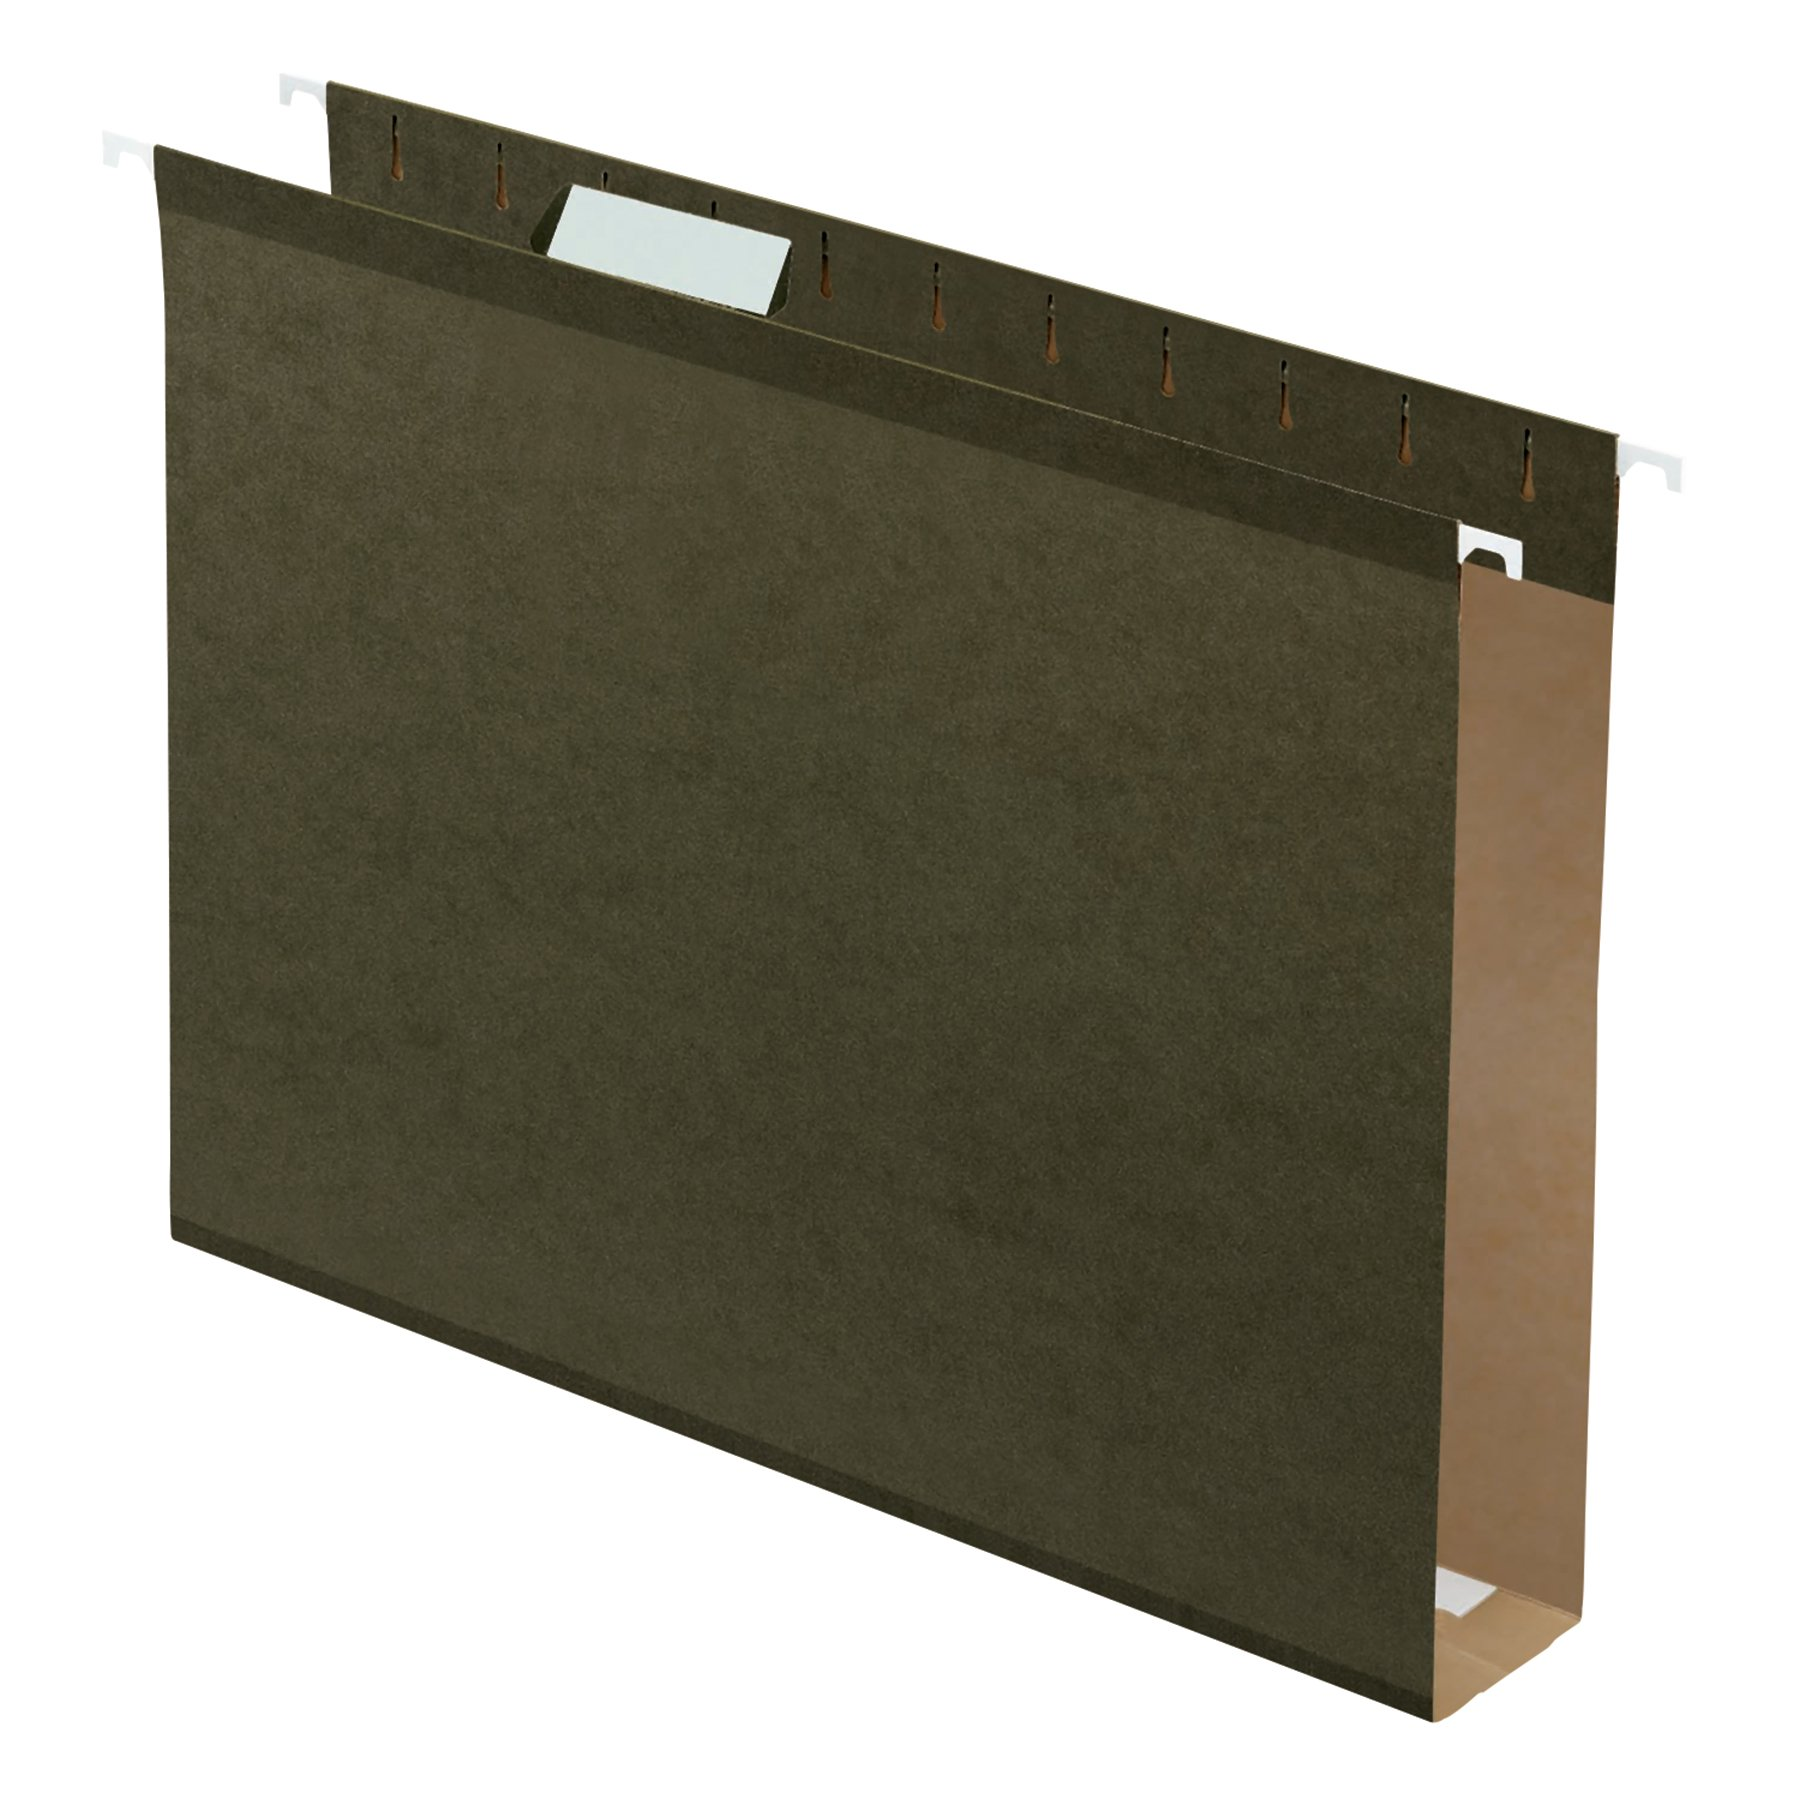 Pendaflex Extra Capacity Reinforced Hanging File Folders, 2'', Letter Size, Standard green, 1/5 Cut, 25/BX (4152x2)